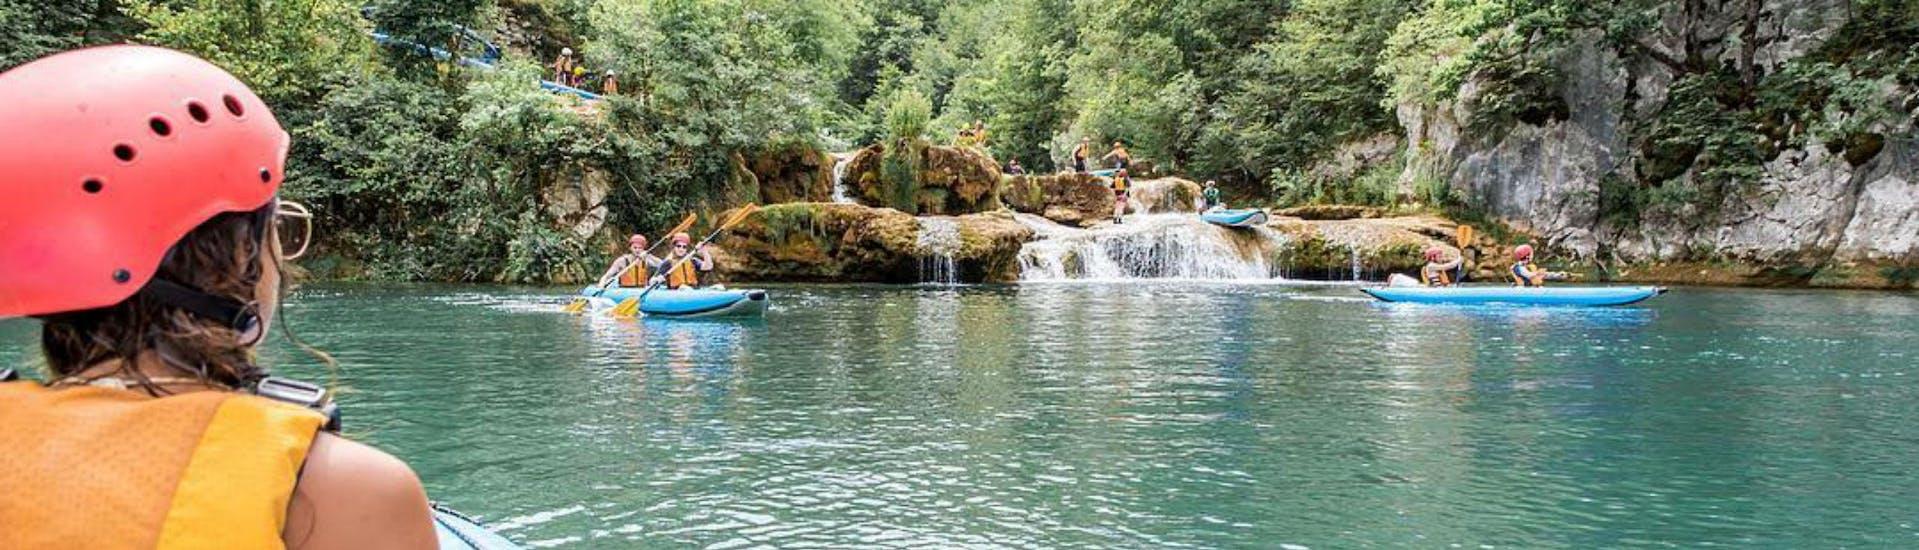 kayaking-on-the-mreznica-river-classic-tour-raftrek-hero